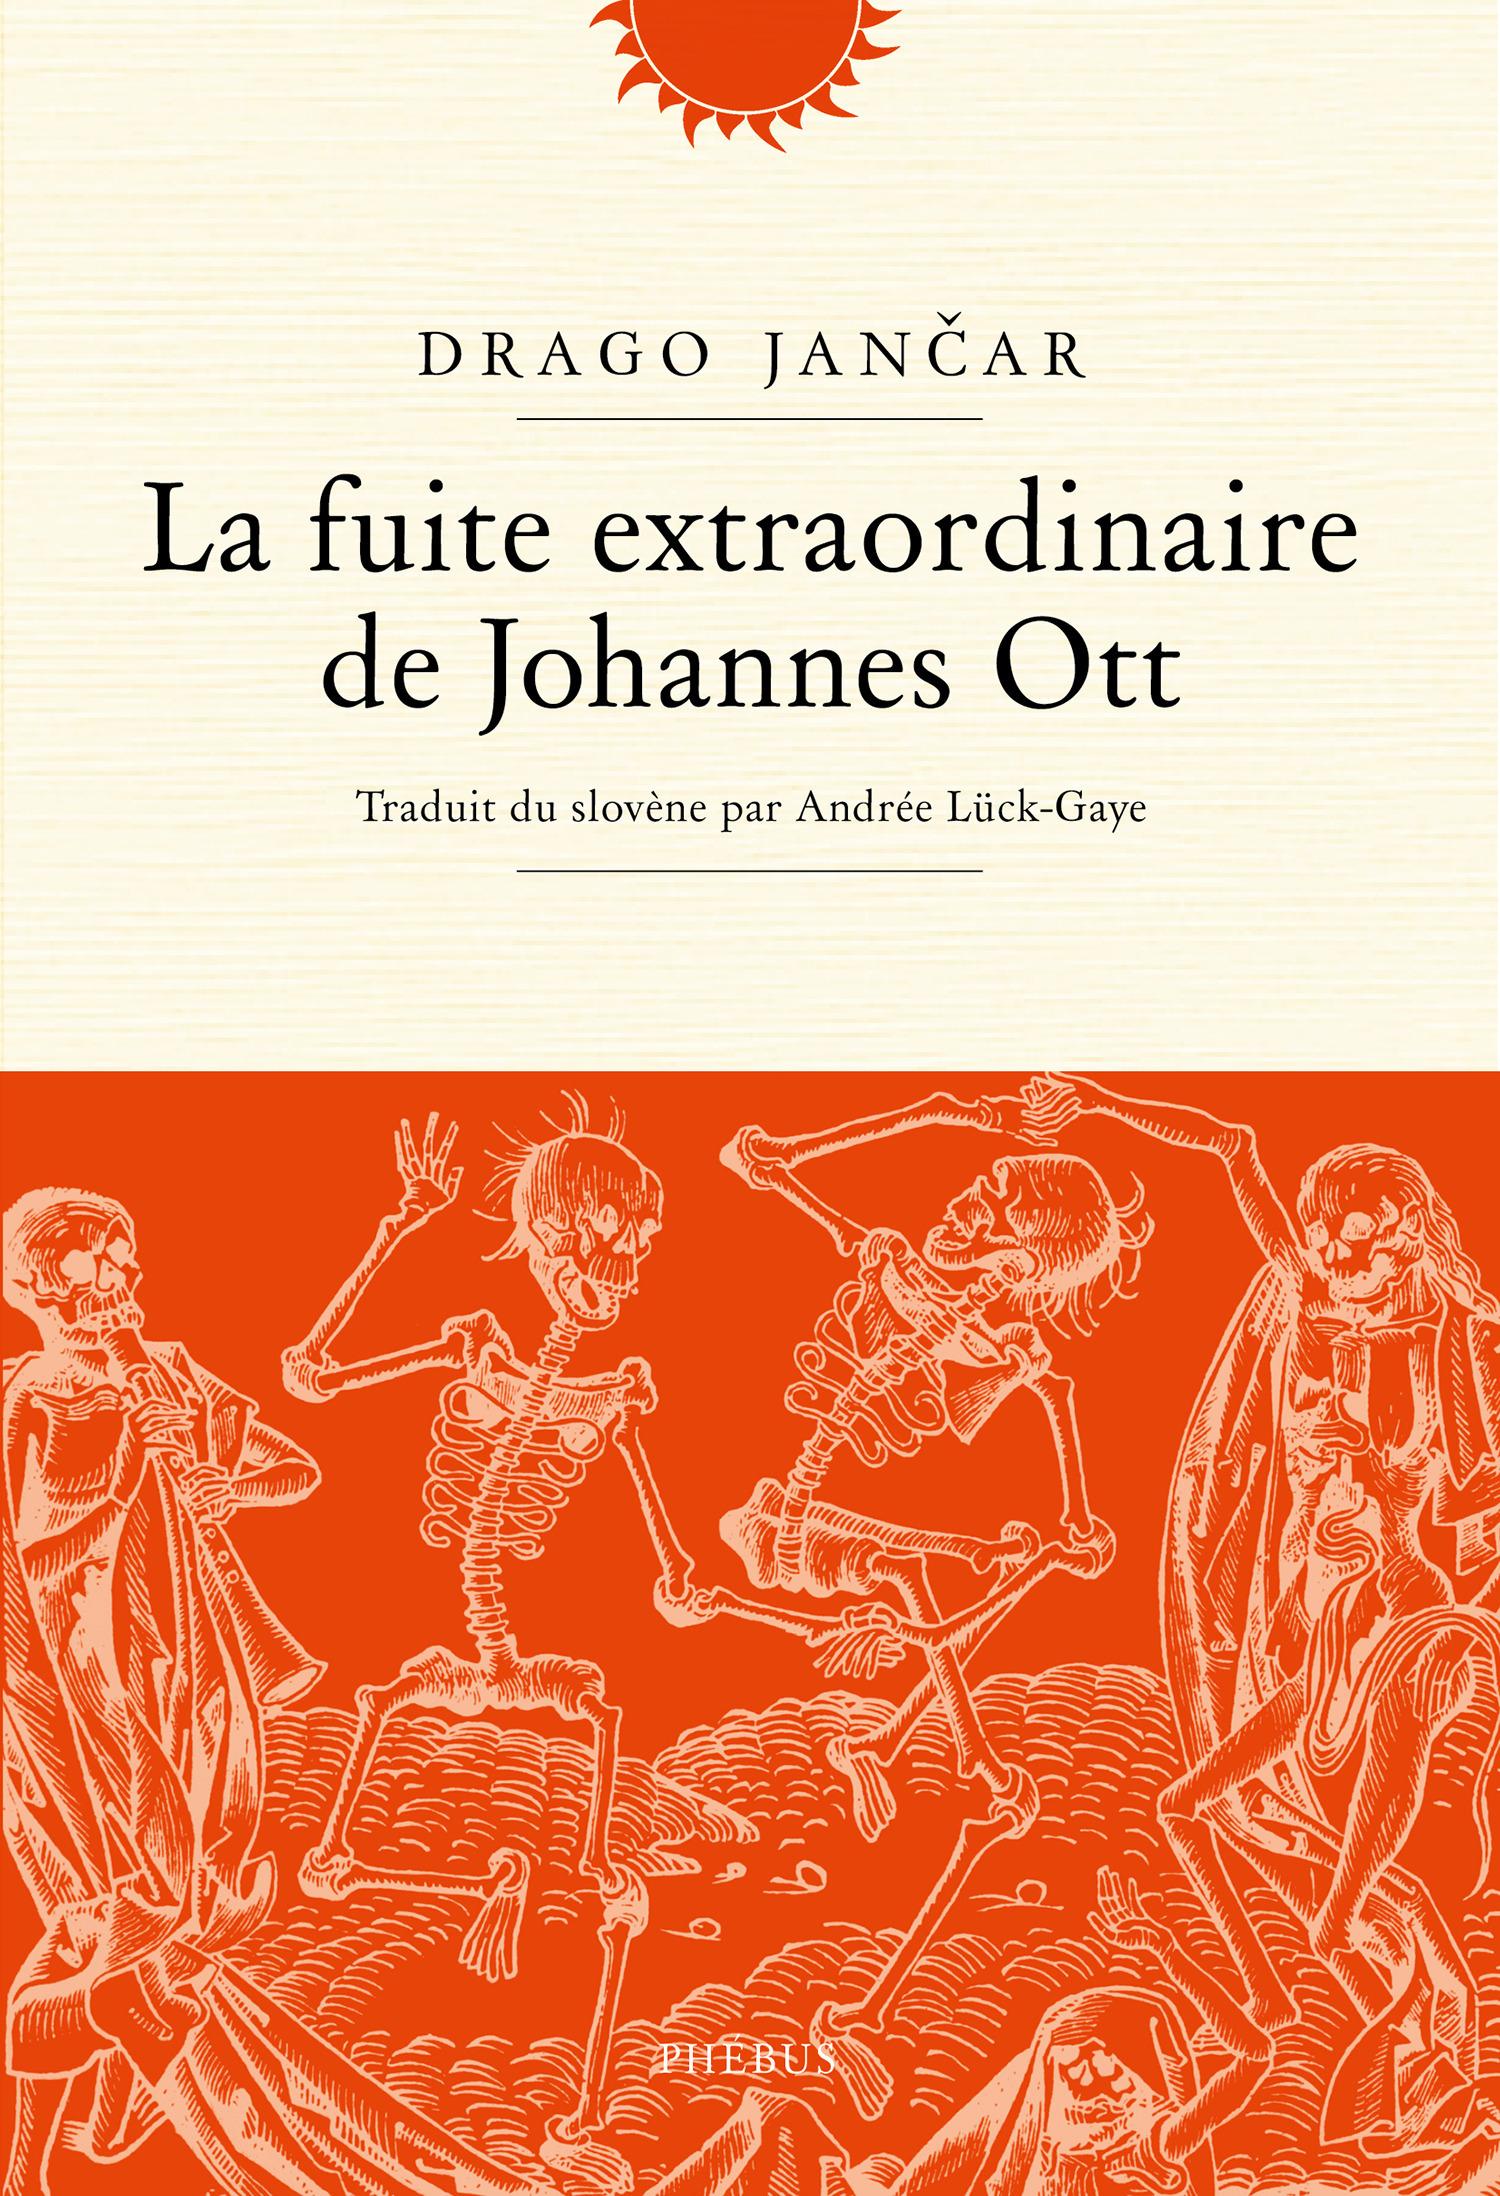 La fuite extraordinaire de Johan Ot